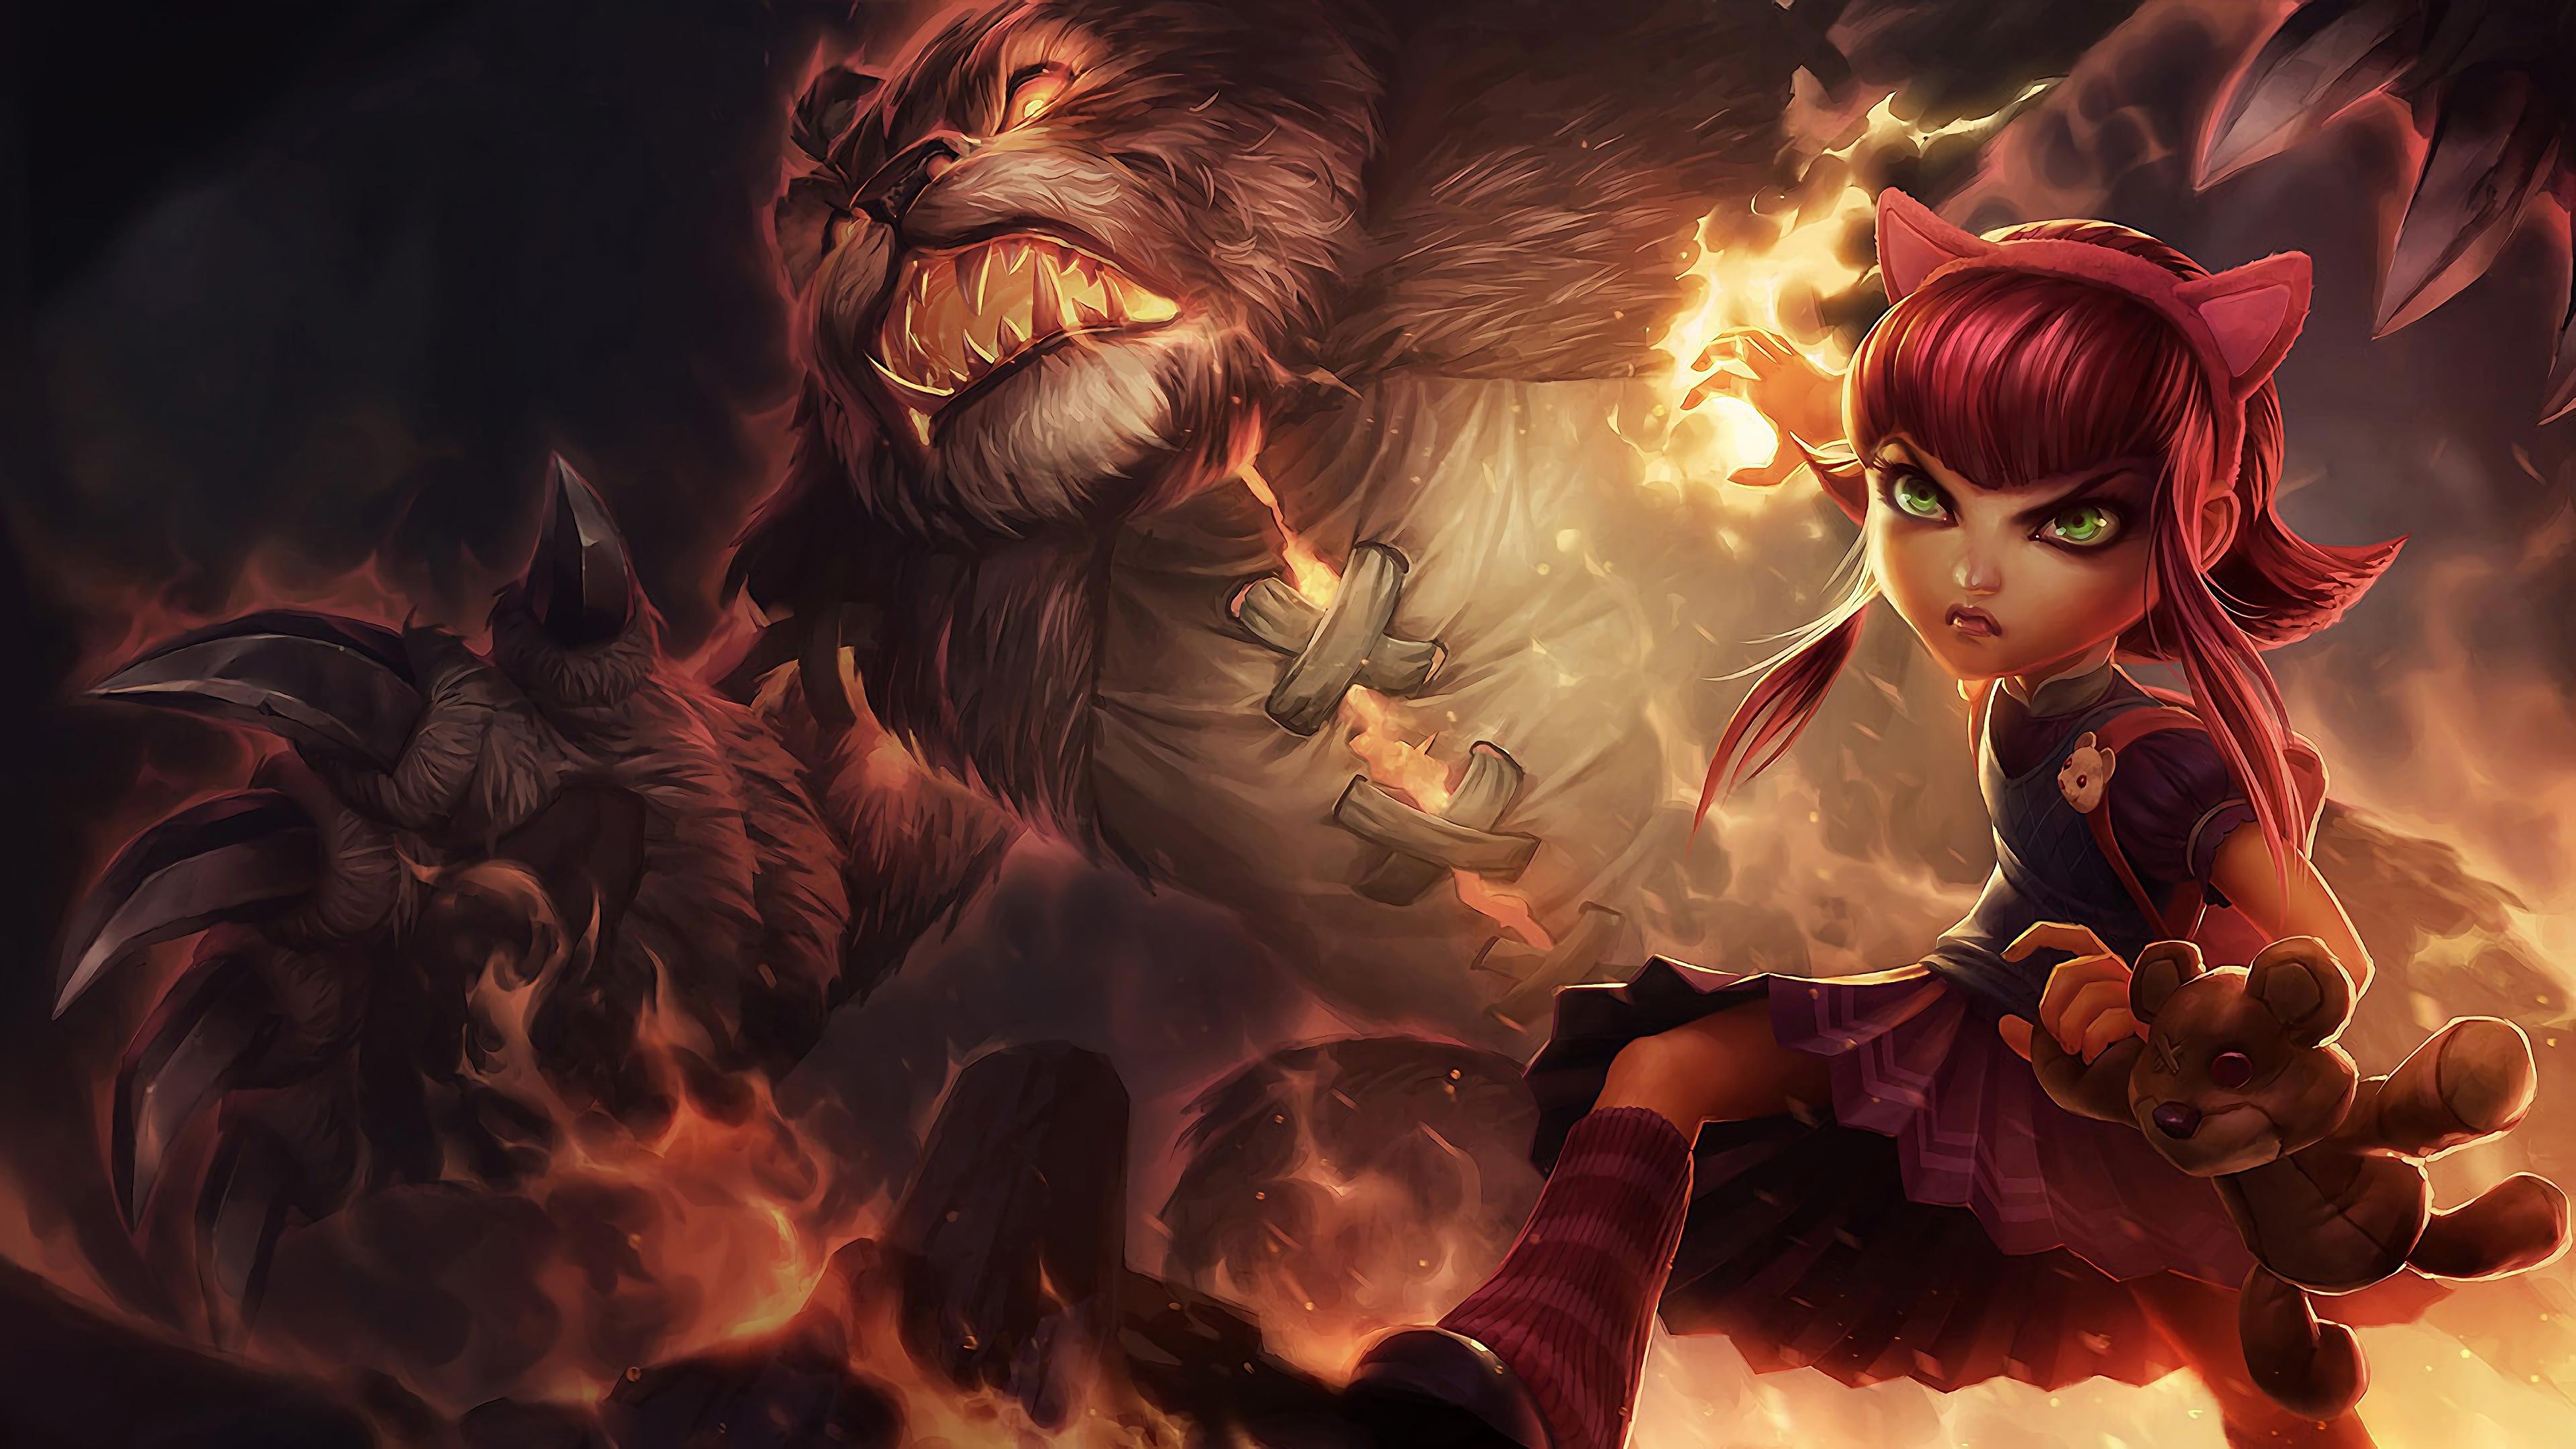 annie lol splash art league of legends 1574100649 - Annie LoL Splash Art League of Legends - league of legends, Annie